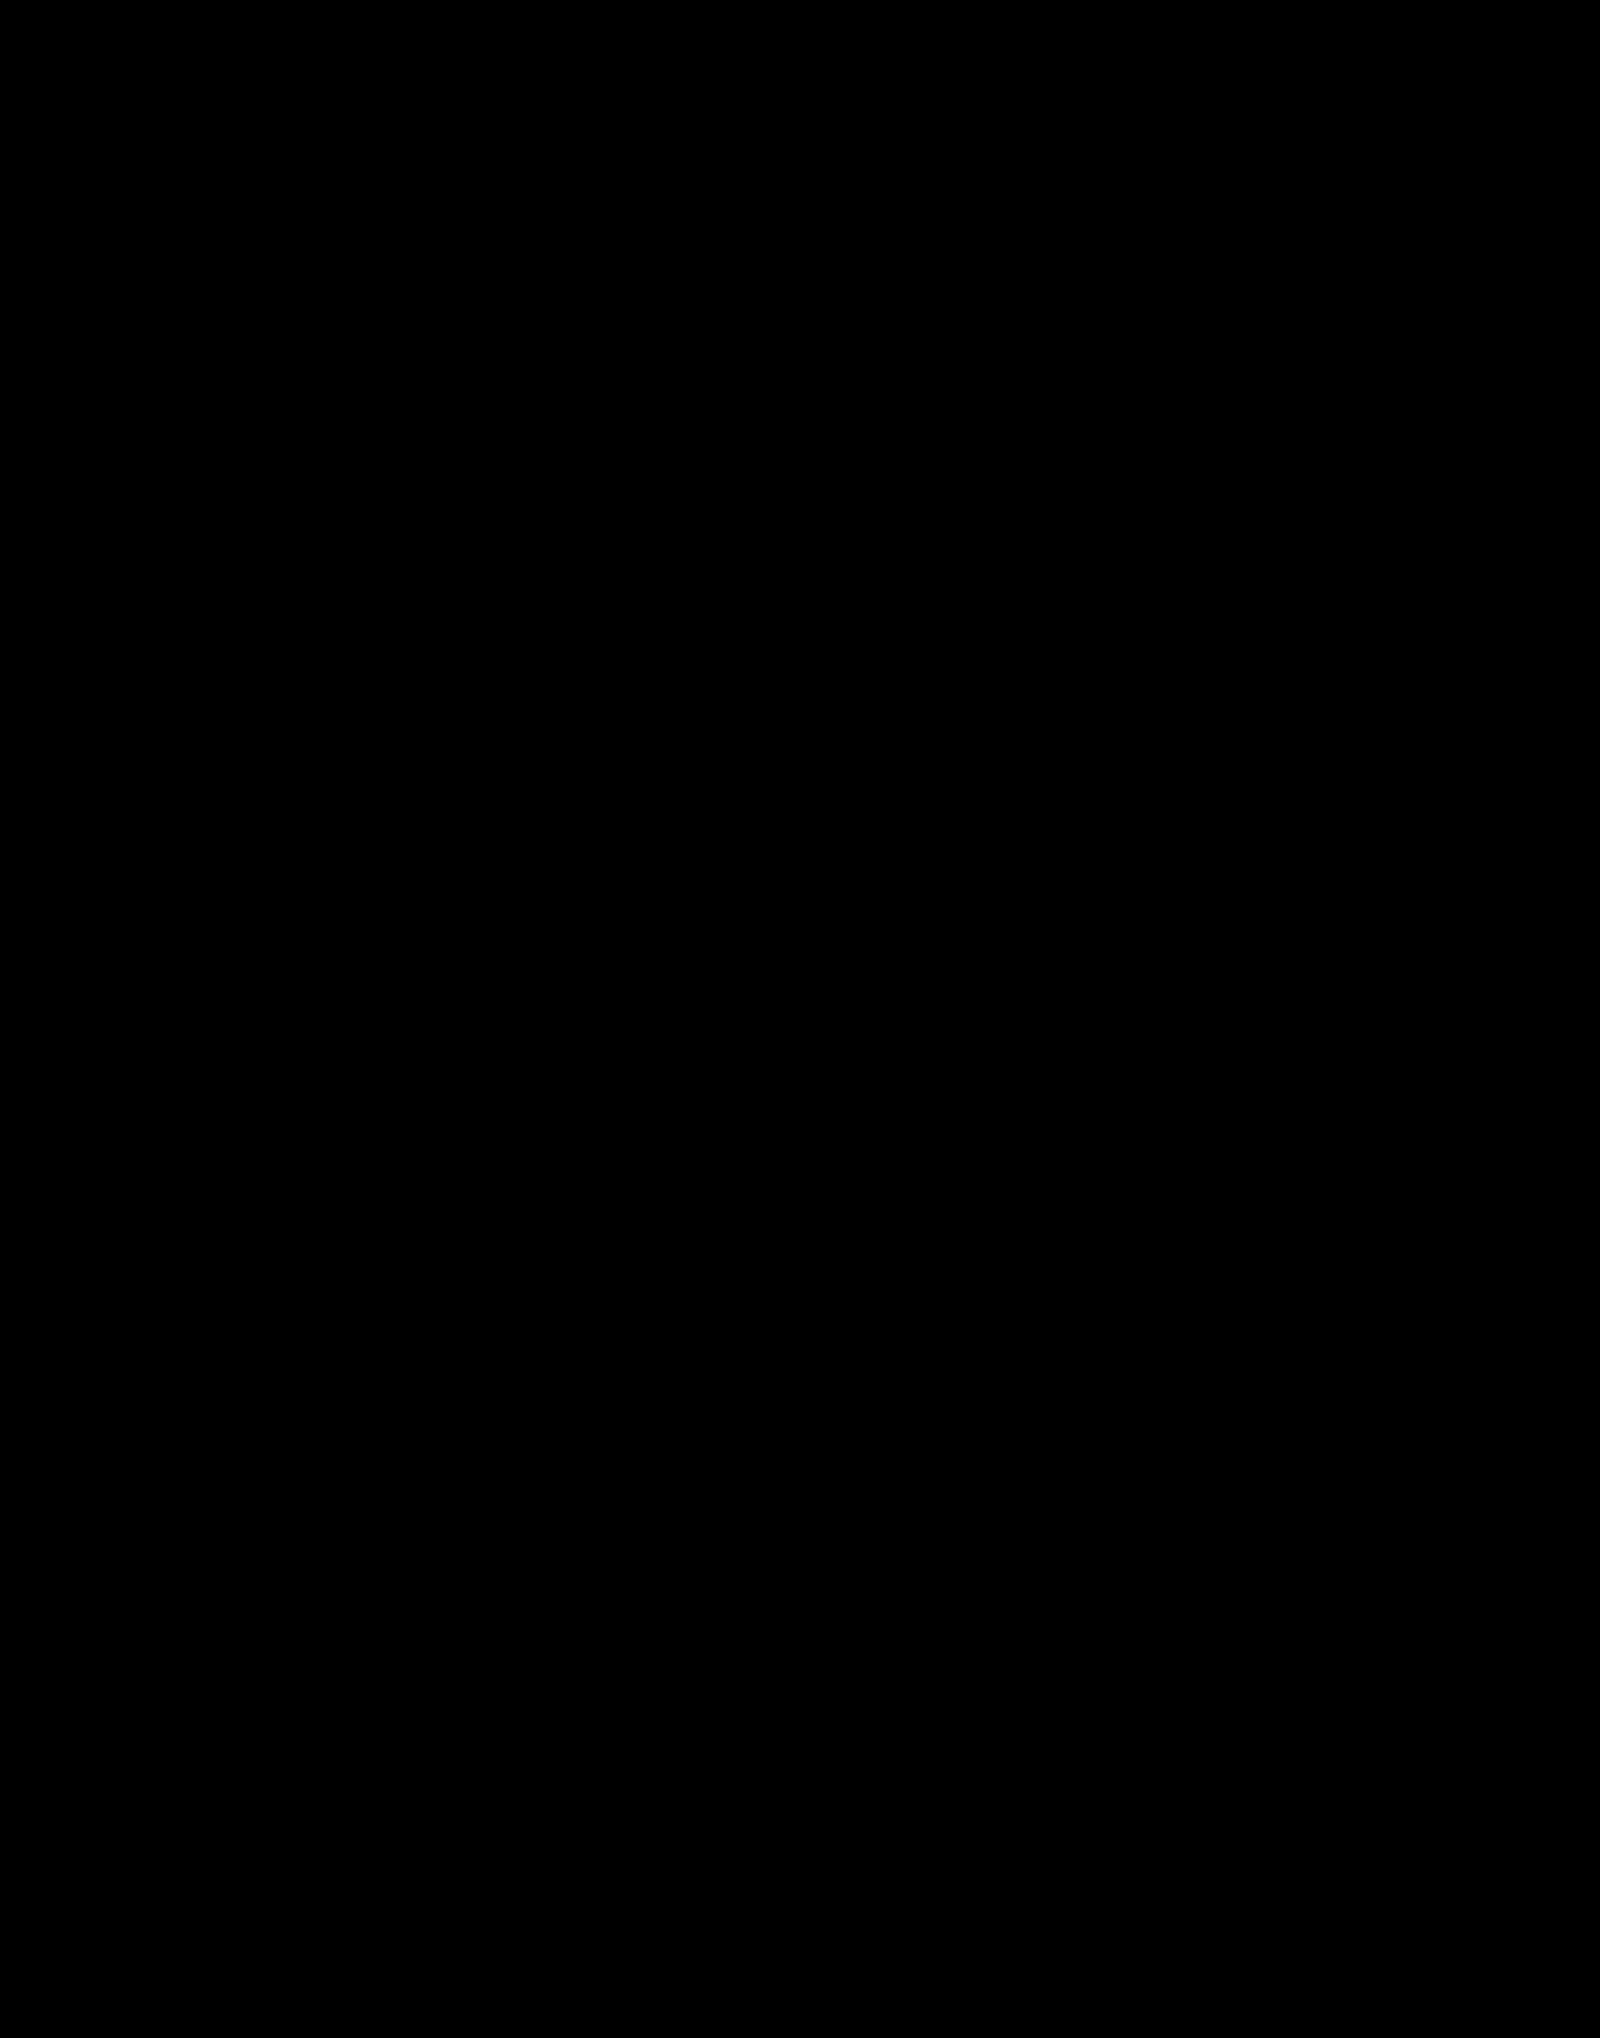 Vase SVG Clip arts